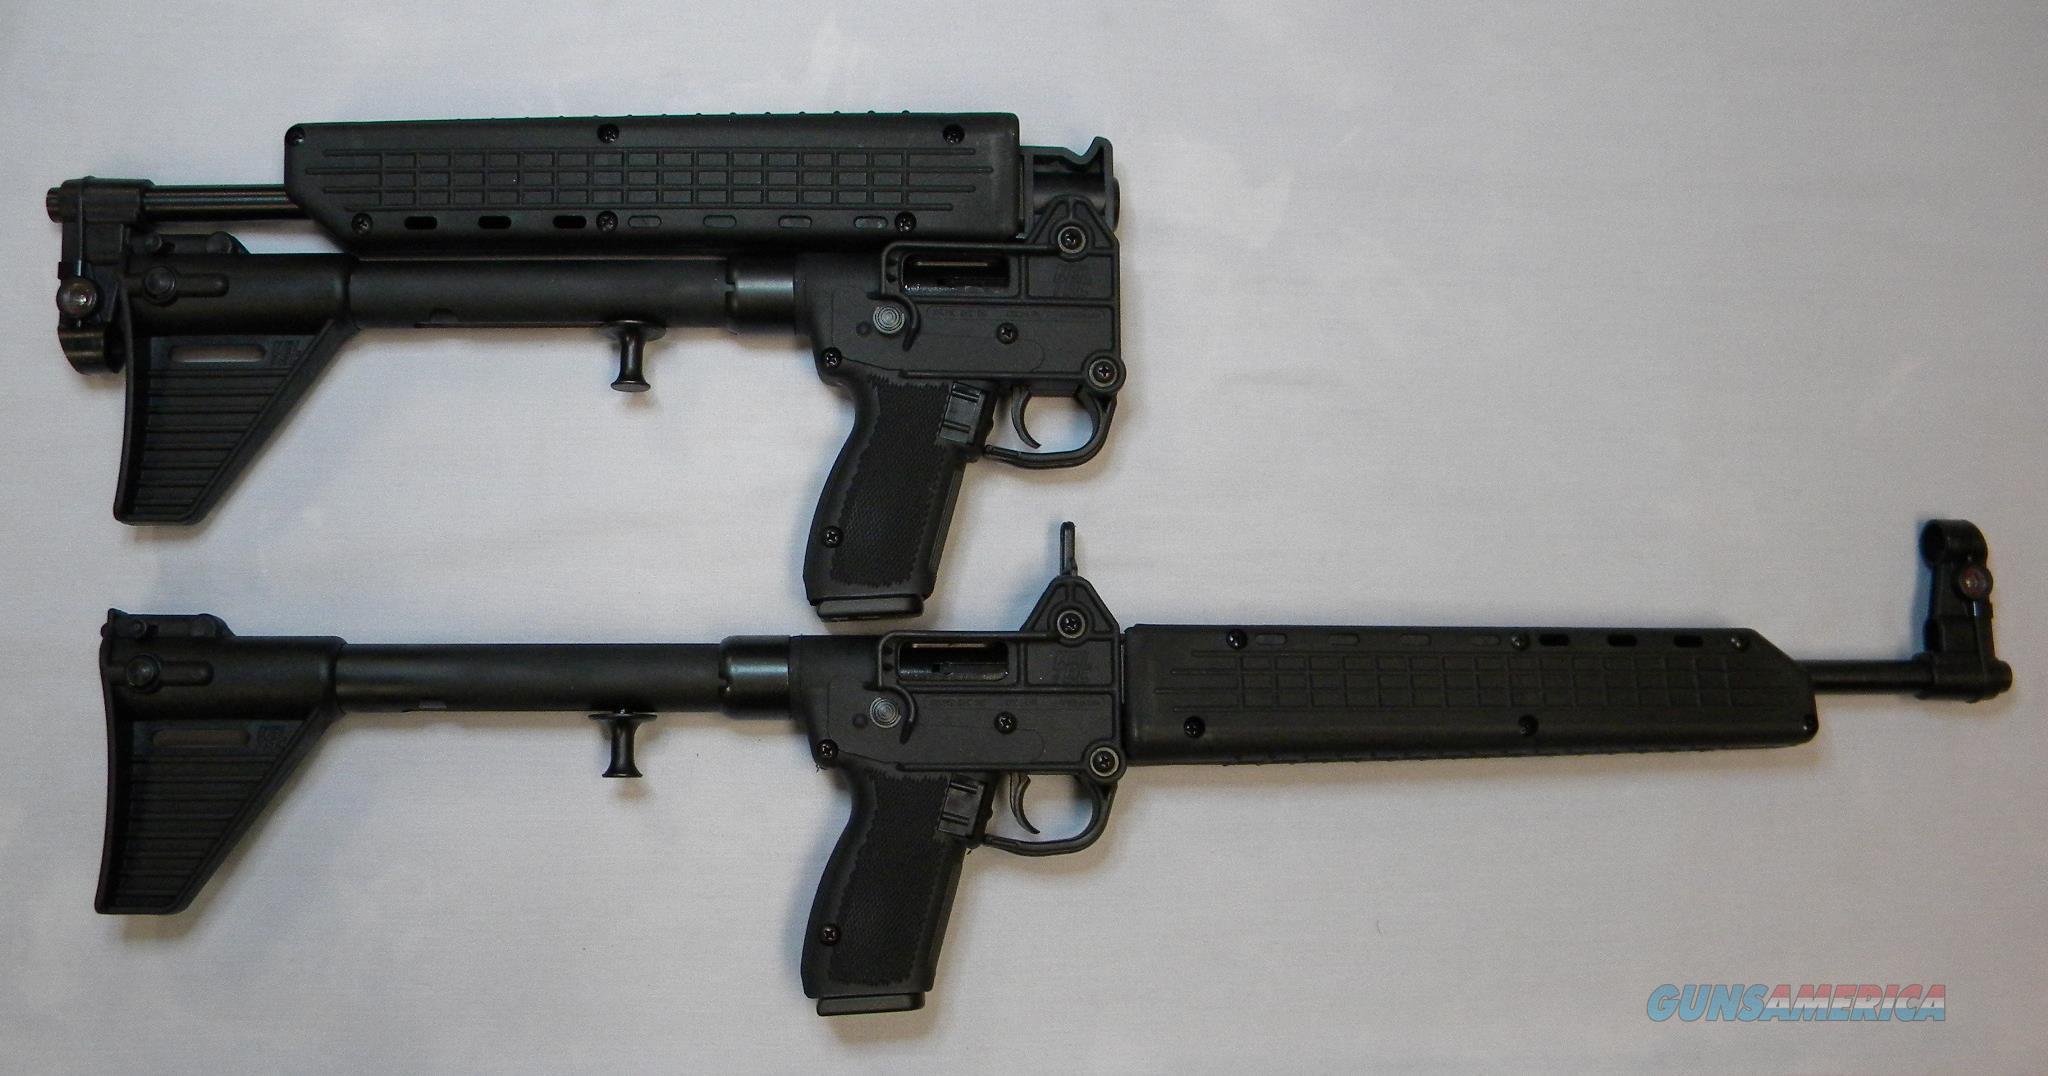 Kel-Tec Sub 2000, 9mm, Uses Beretta Magazines!  Guns > Rifles > Kel-Tec Rifles